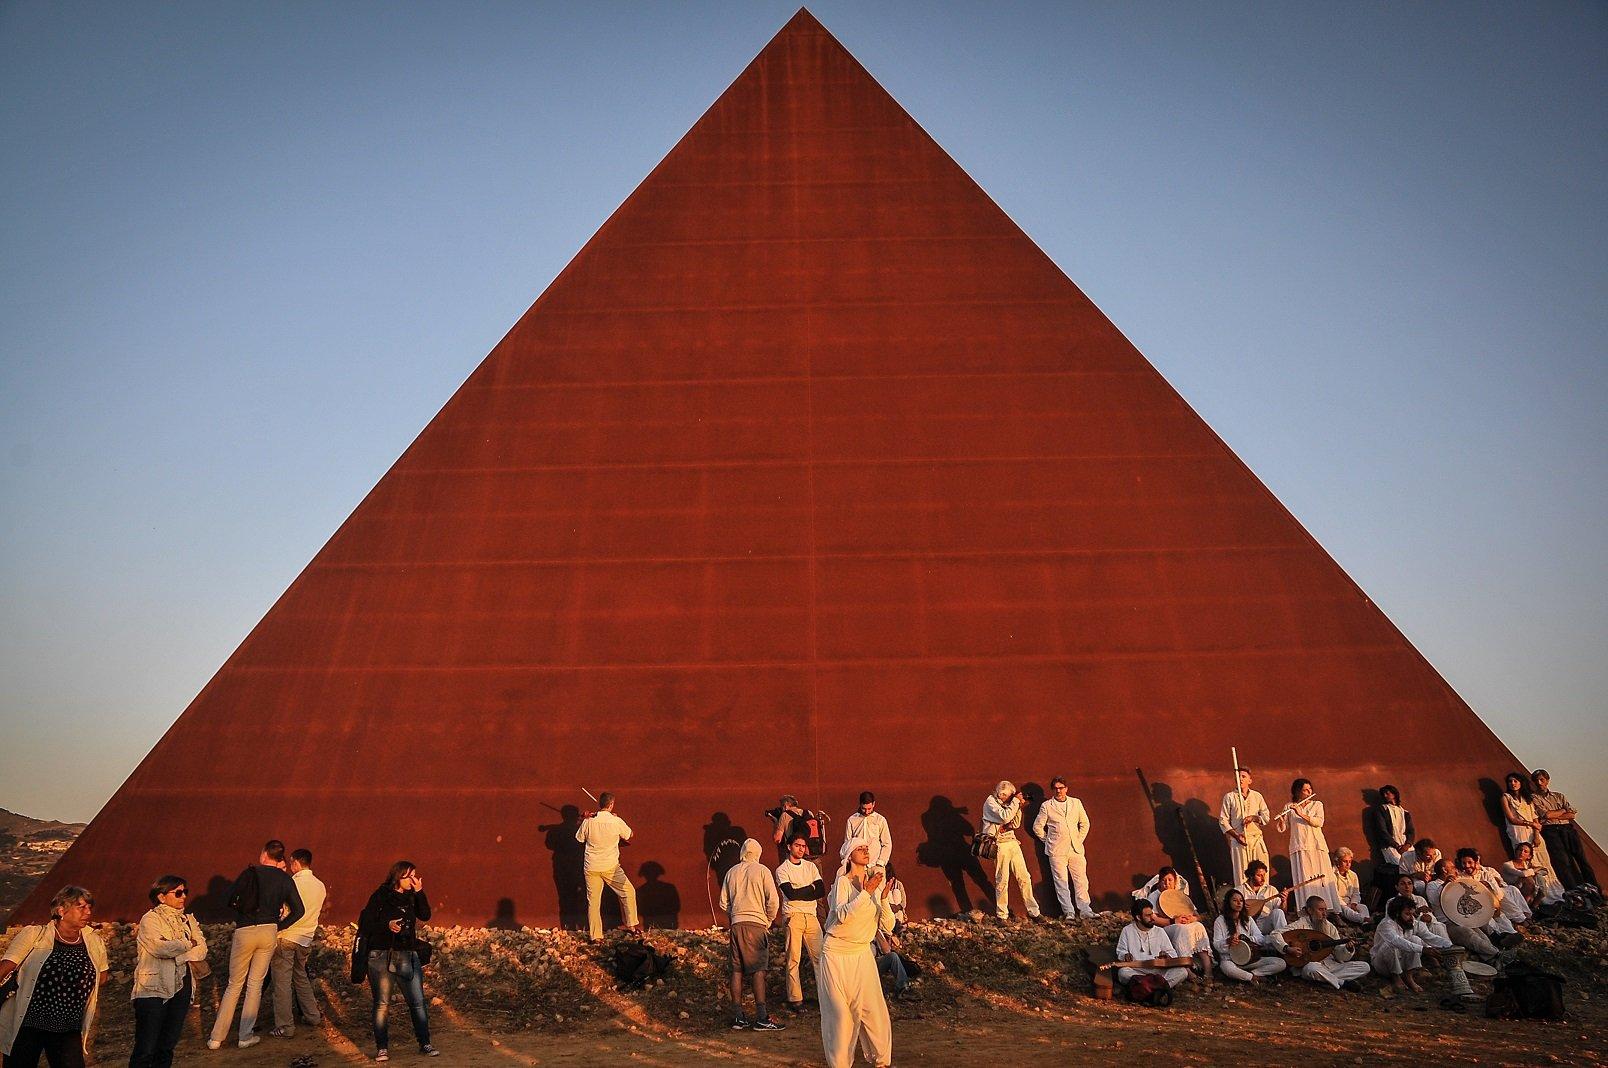 38° Parallelo - Piramide (2010)